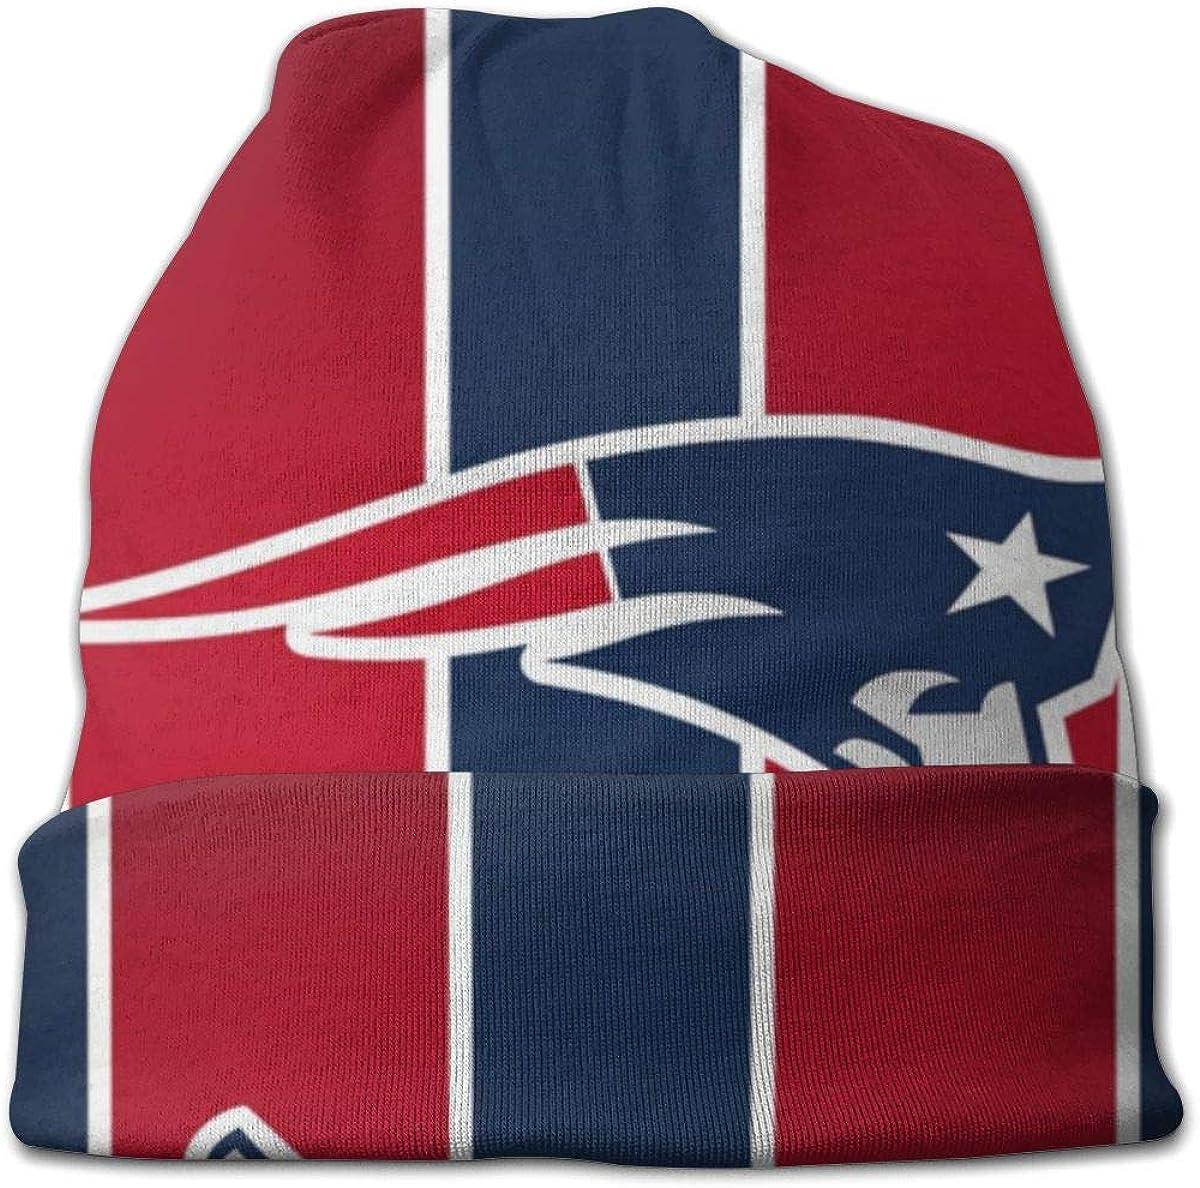 Sinobullit Kids Beanie Caps New England Patriots Skull Cap Knitting Hat Warm Winter Knit Hats for Boys Girls Black